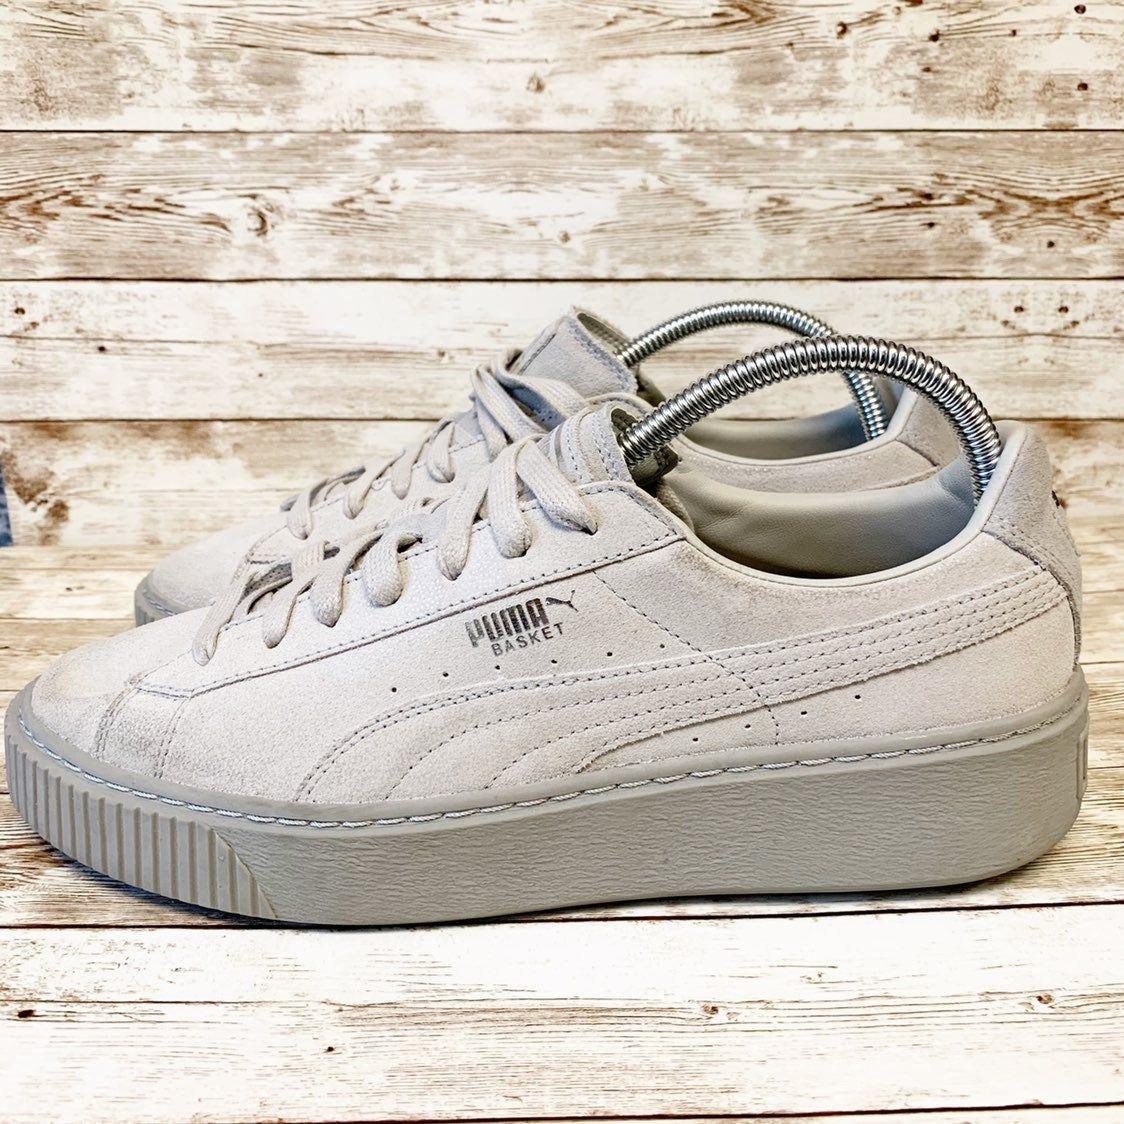 Puma basket platform sneakers women's